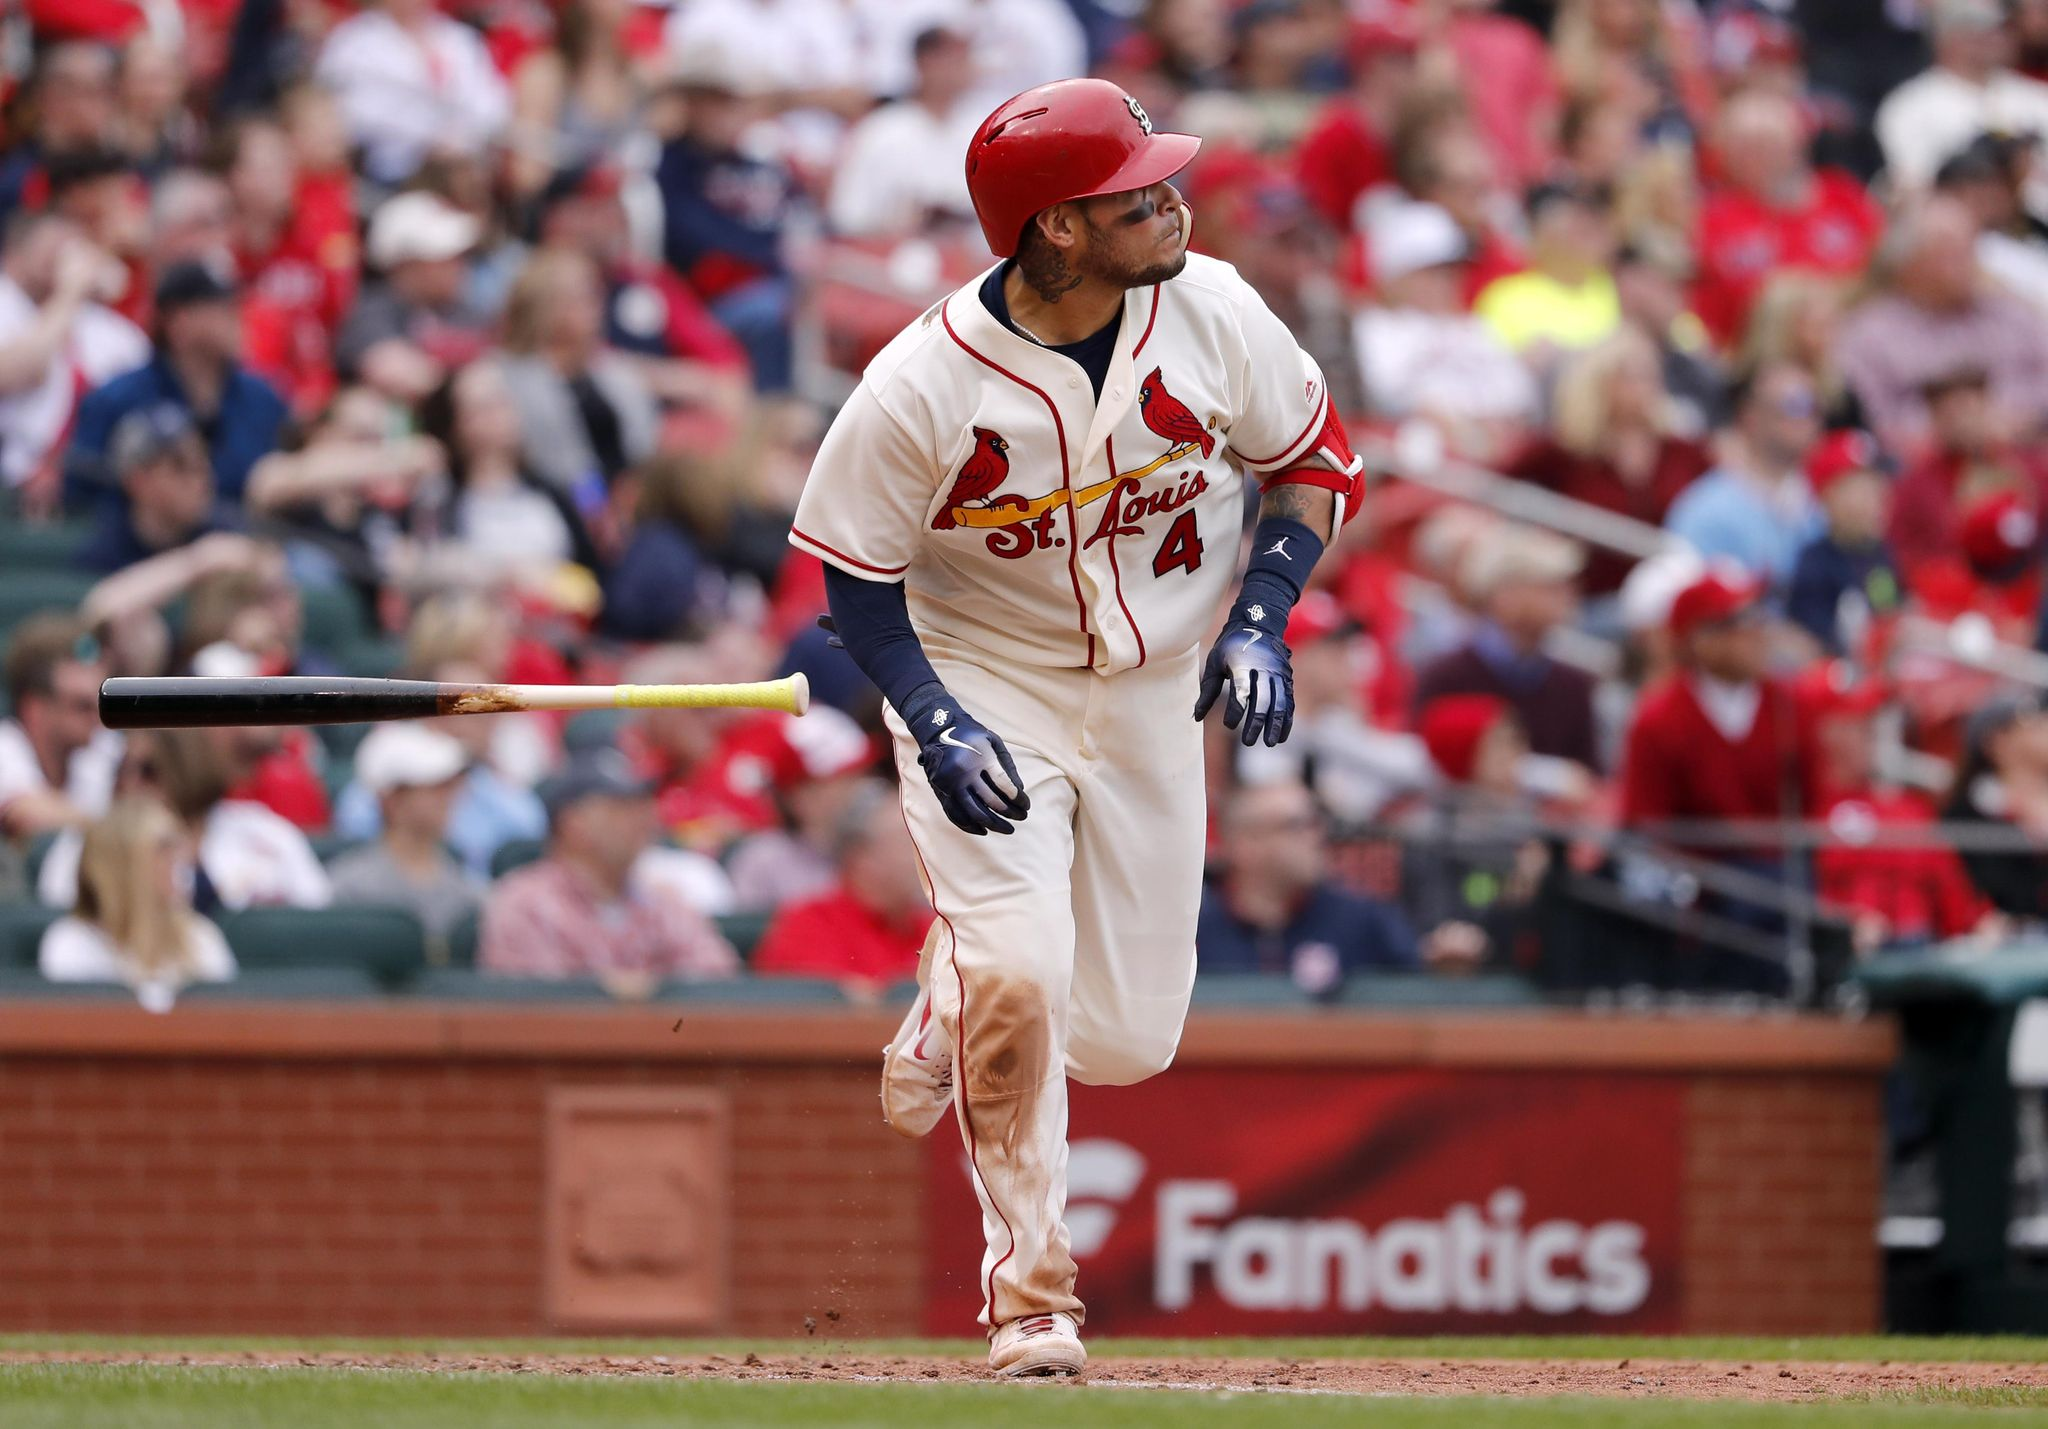 Reds_cardinals_baseball_52197_s2048x1429